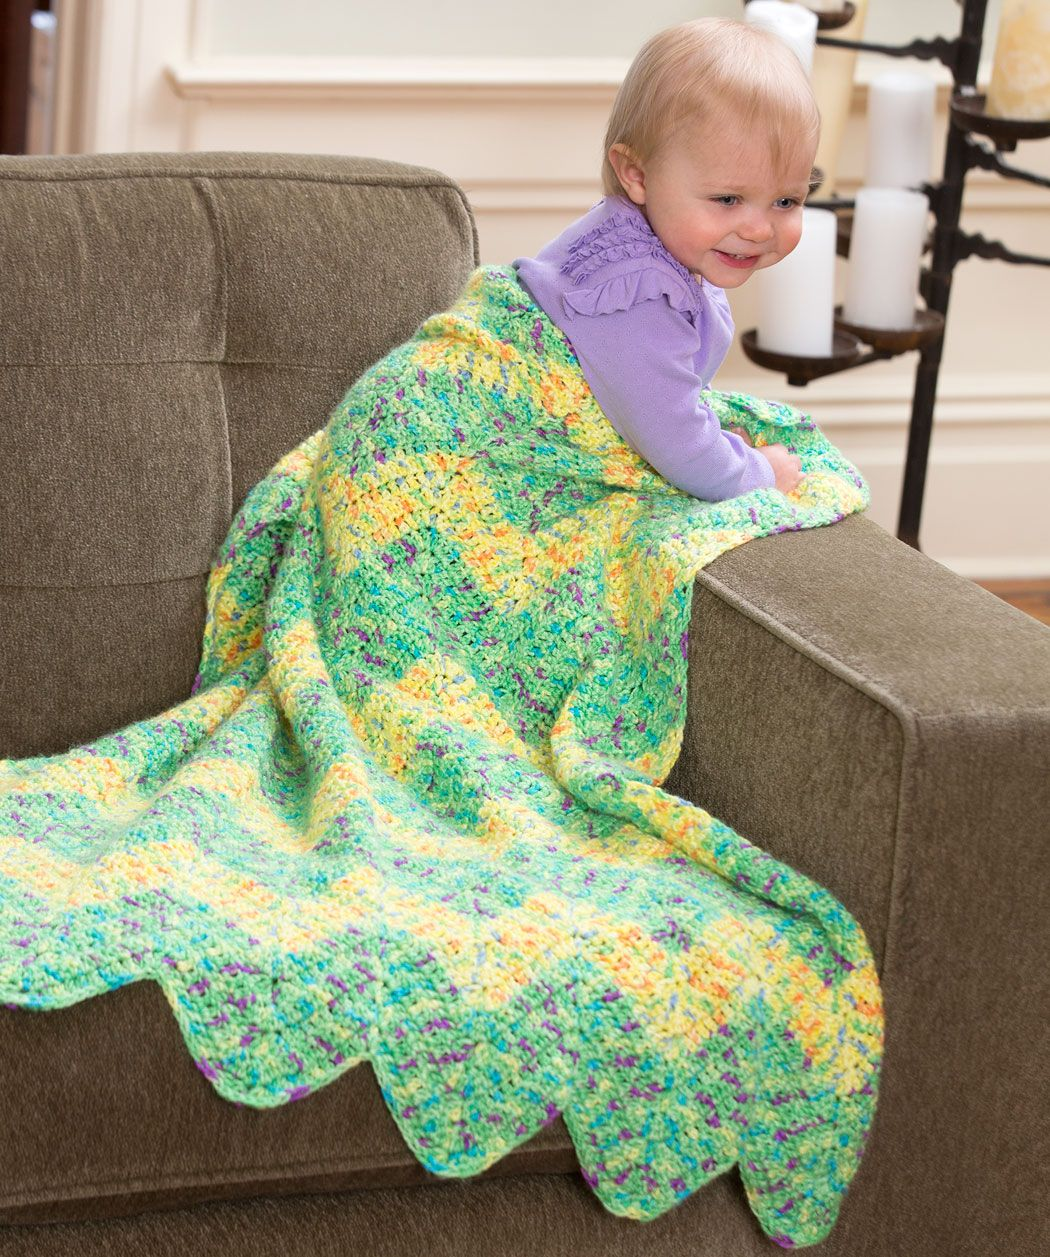 Chevron Baby Blanket Free Crochet Pattern from Red Heart Yarns | New